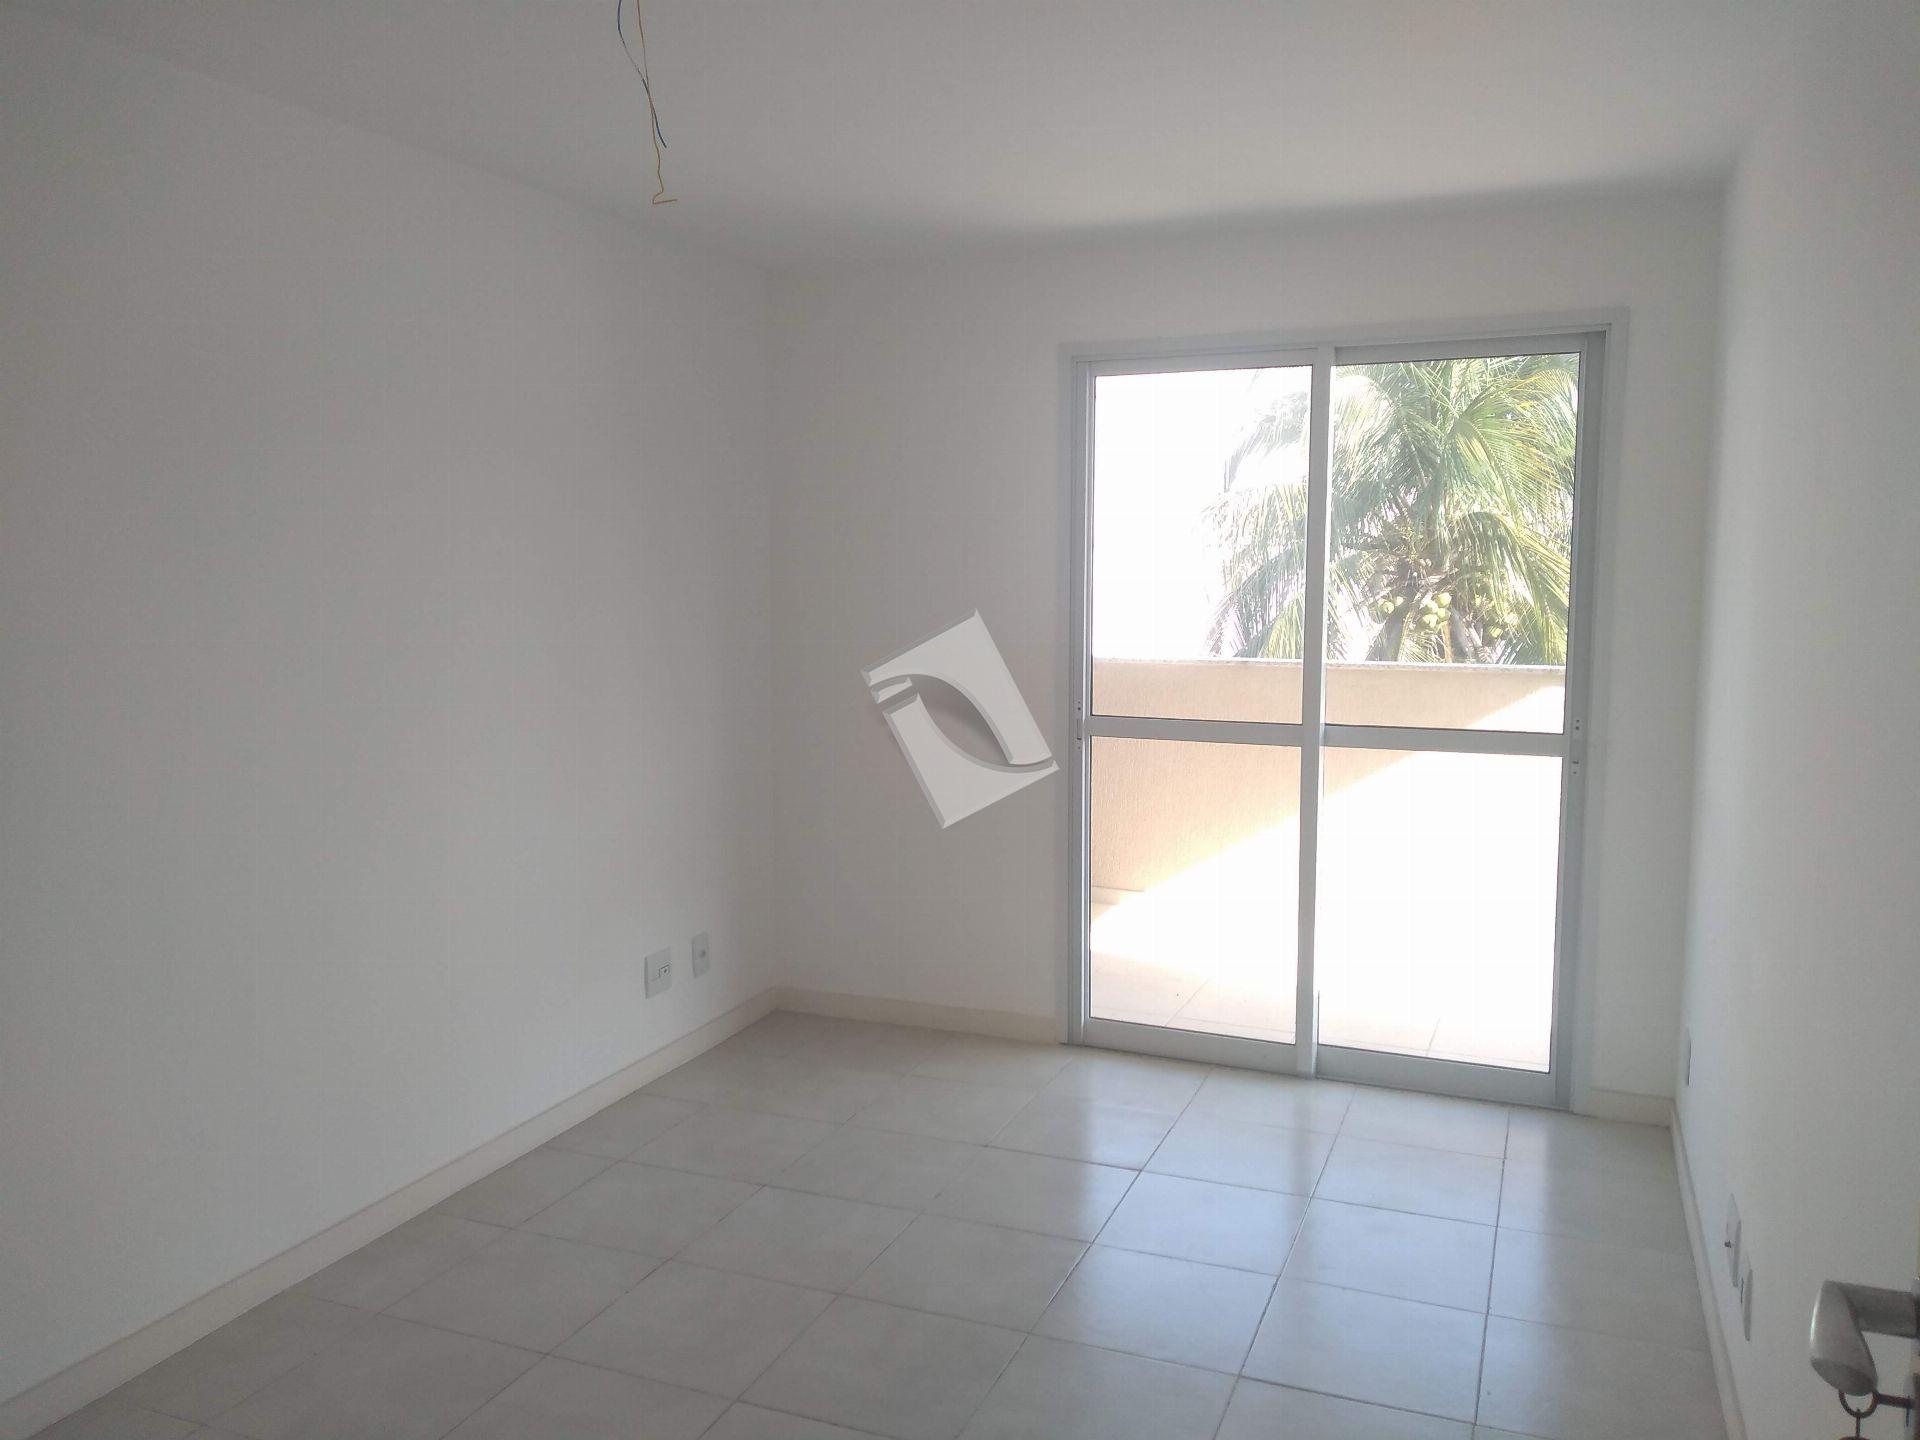 Apartamento Para Alugar - Recreio dos Bandeirantes - Rio de Janeiro - RJ - 042C - 5